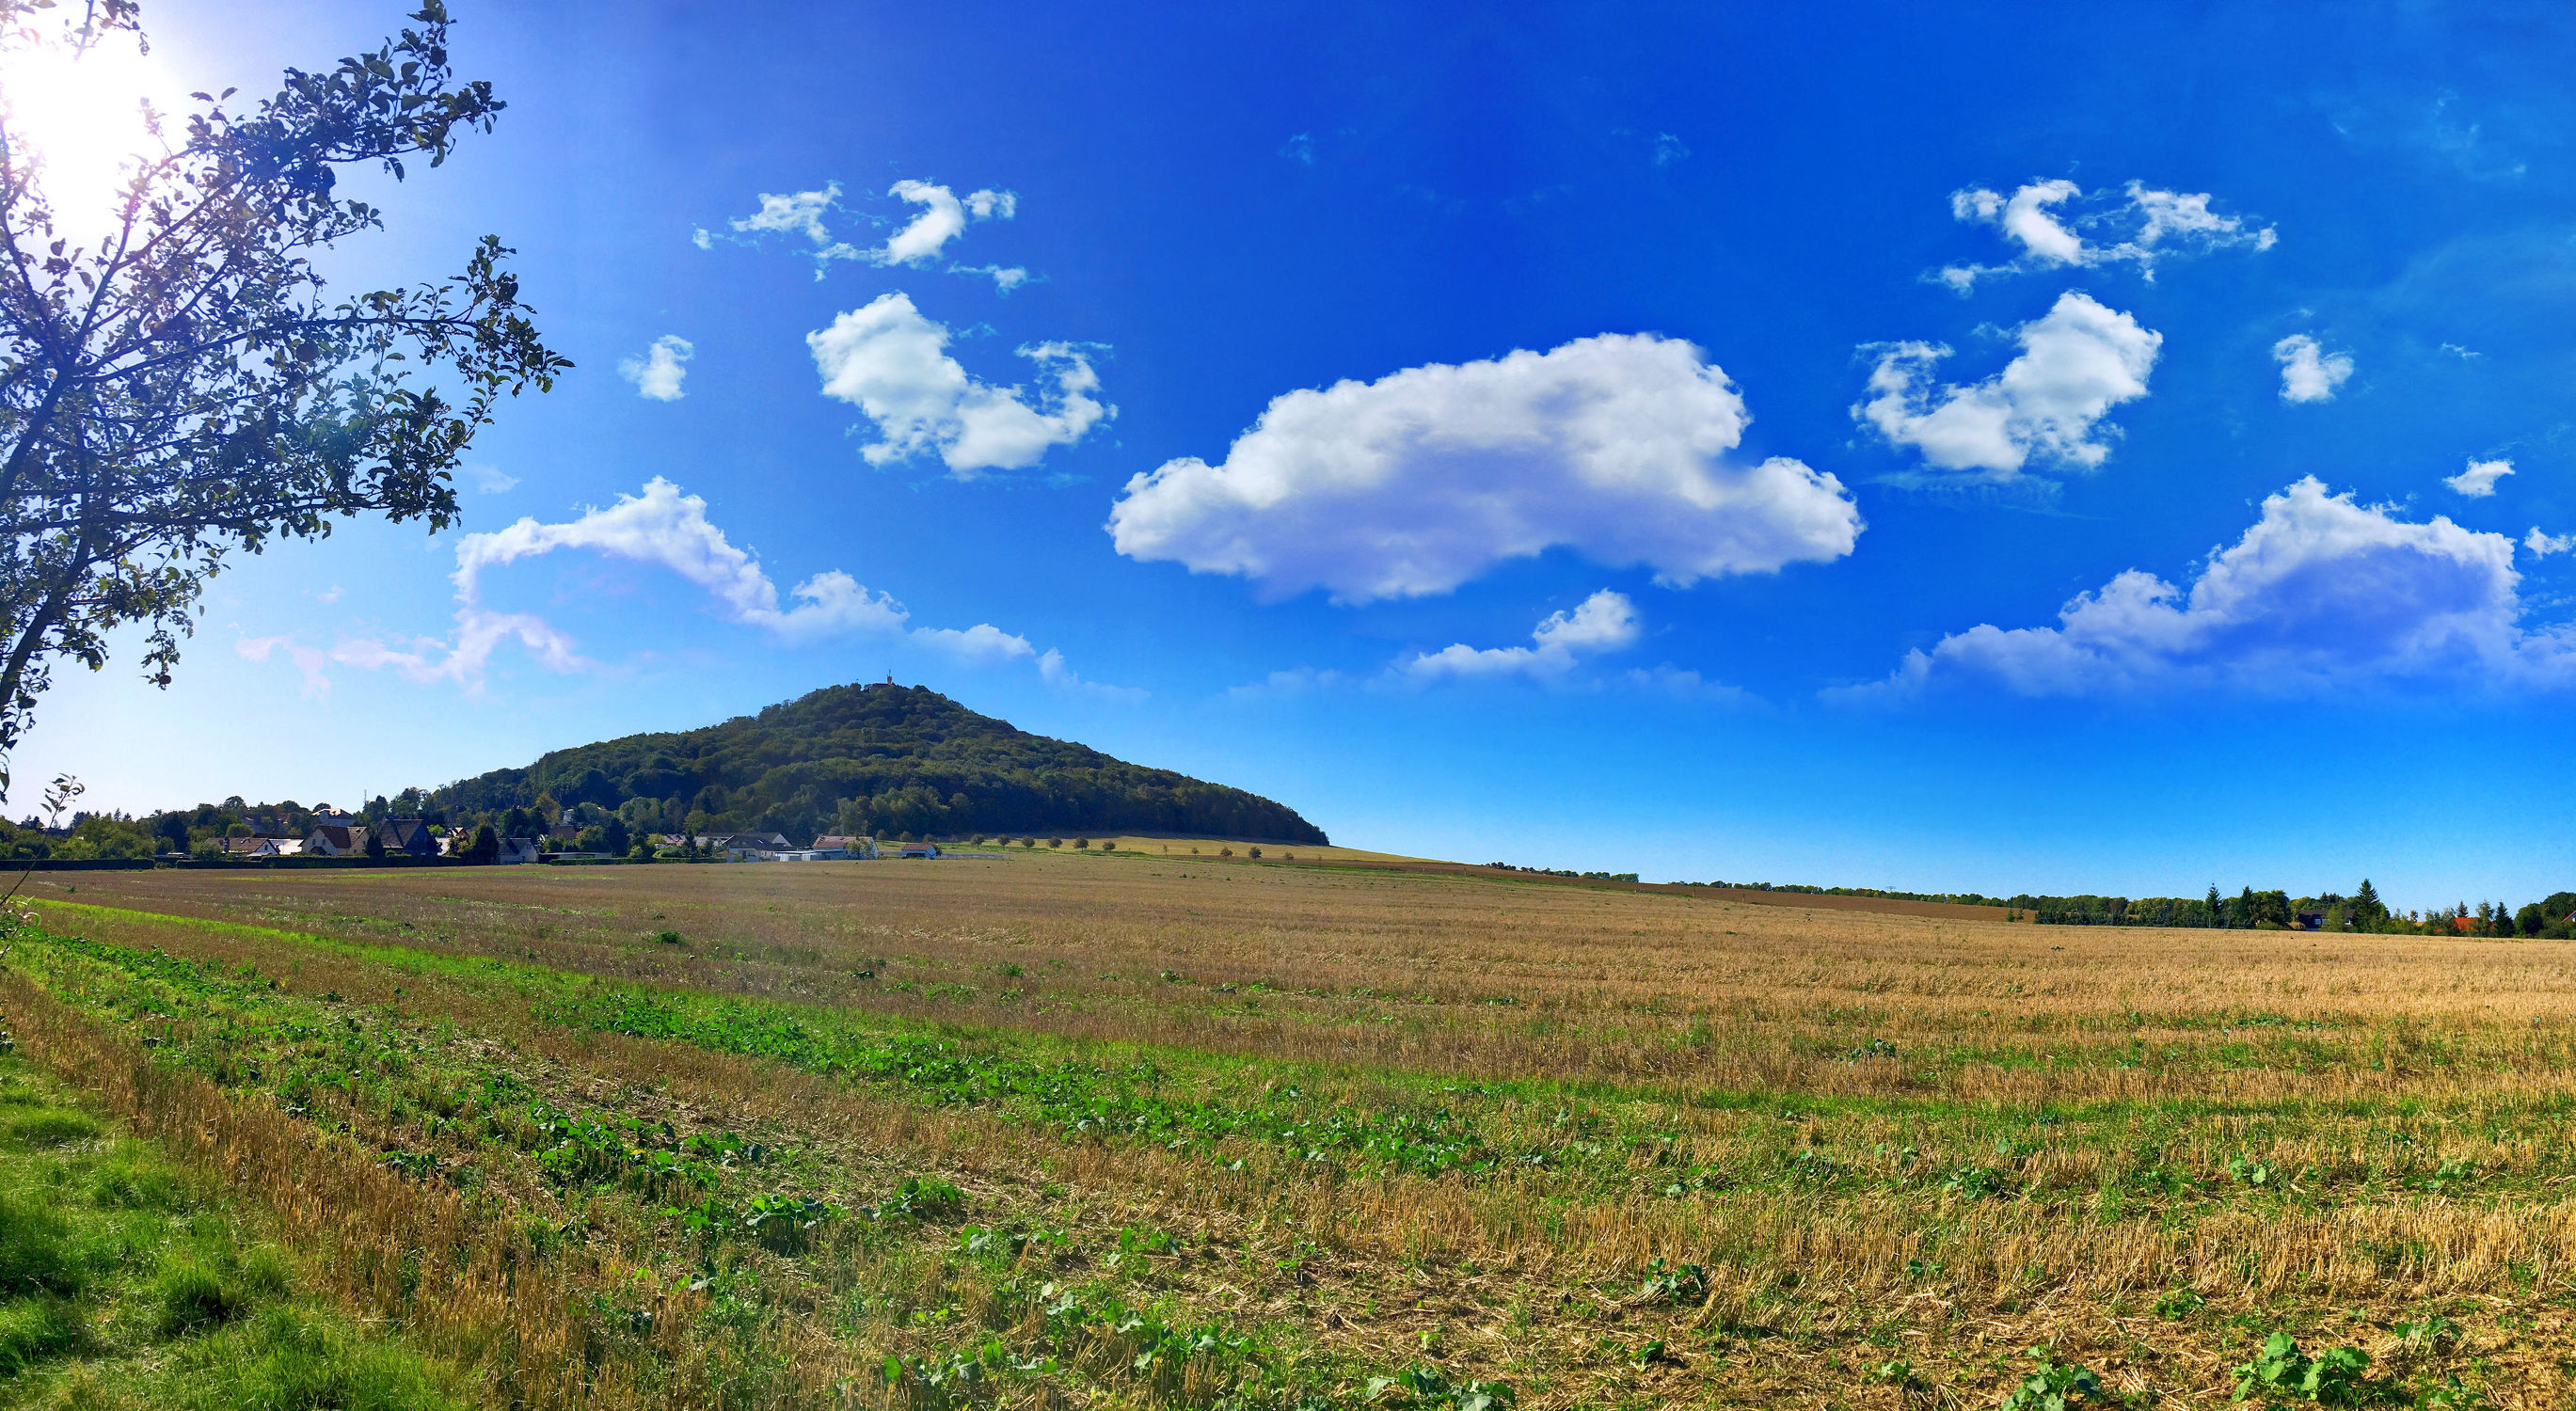 Bild mit Wolken, Panorama, Wolkenhimmel, Stadt Görlitz, Görlitz, Feld, Landeskrone, Feldblick, Panorama Landeskrone, Blick über das Feld, Görlitz Panorama